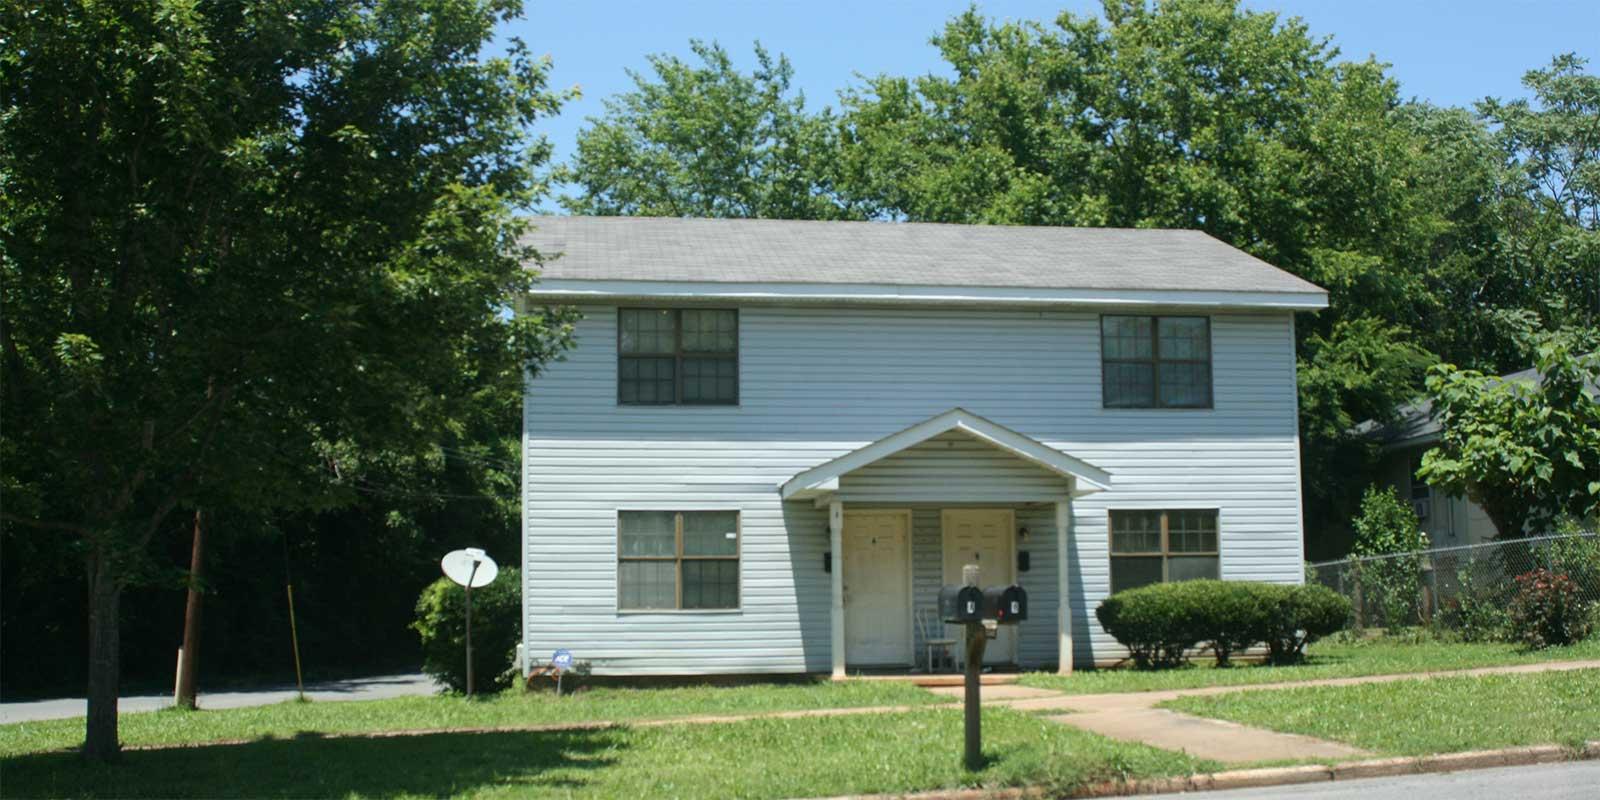 1-B East 9th Street, Rome, Georgia 30161, 2 Bedrooms Bedrooms, ,1 BathroomBathrooms,Apartment,Rental,East 9th Street,1028